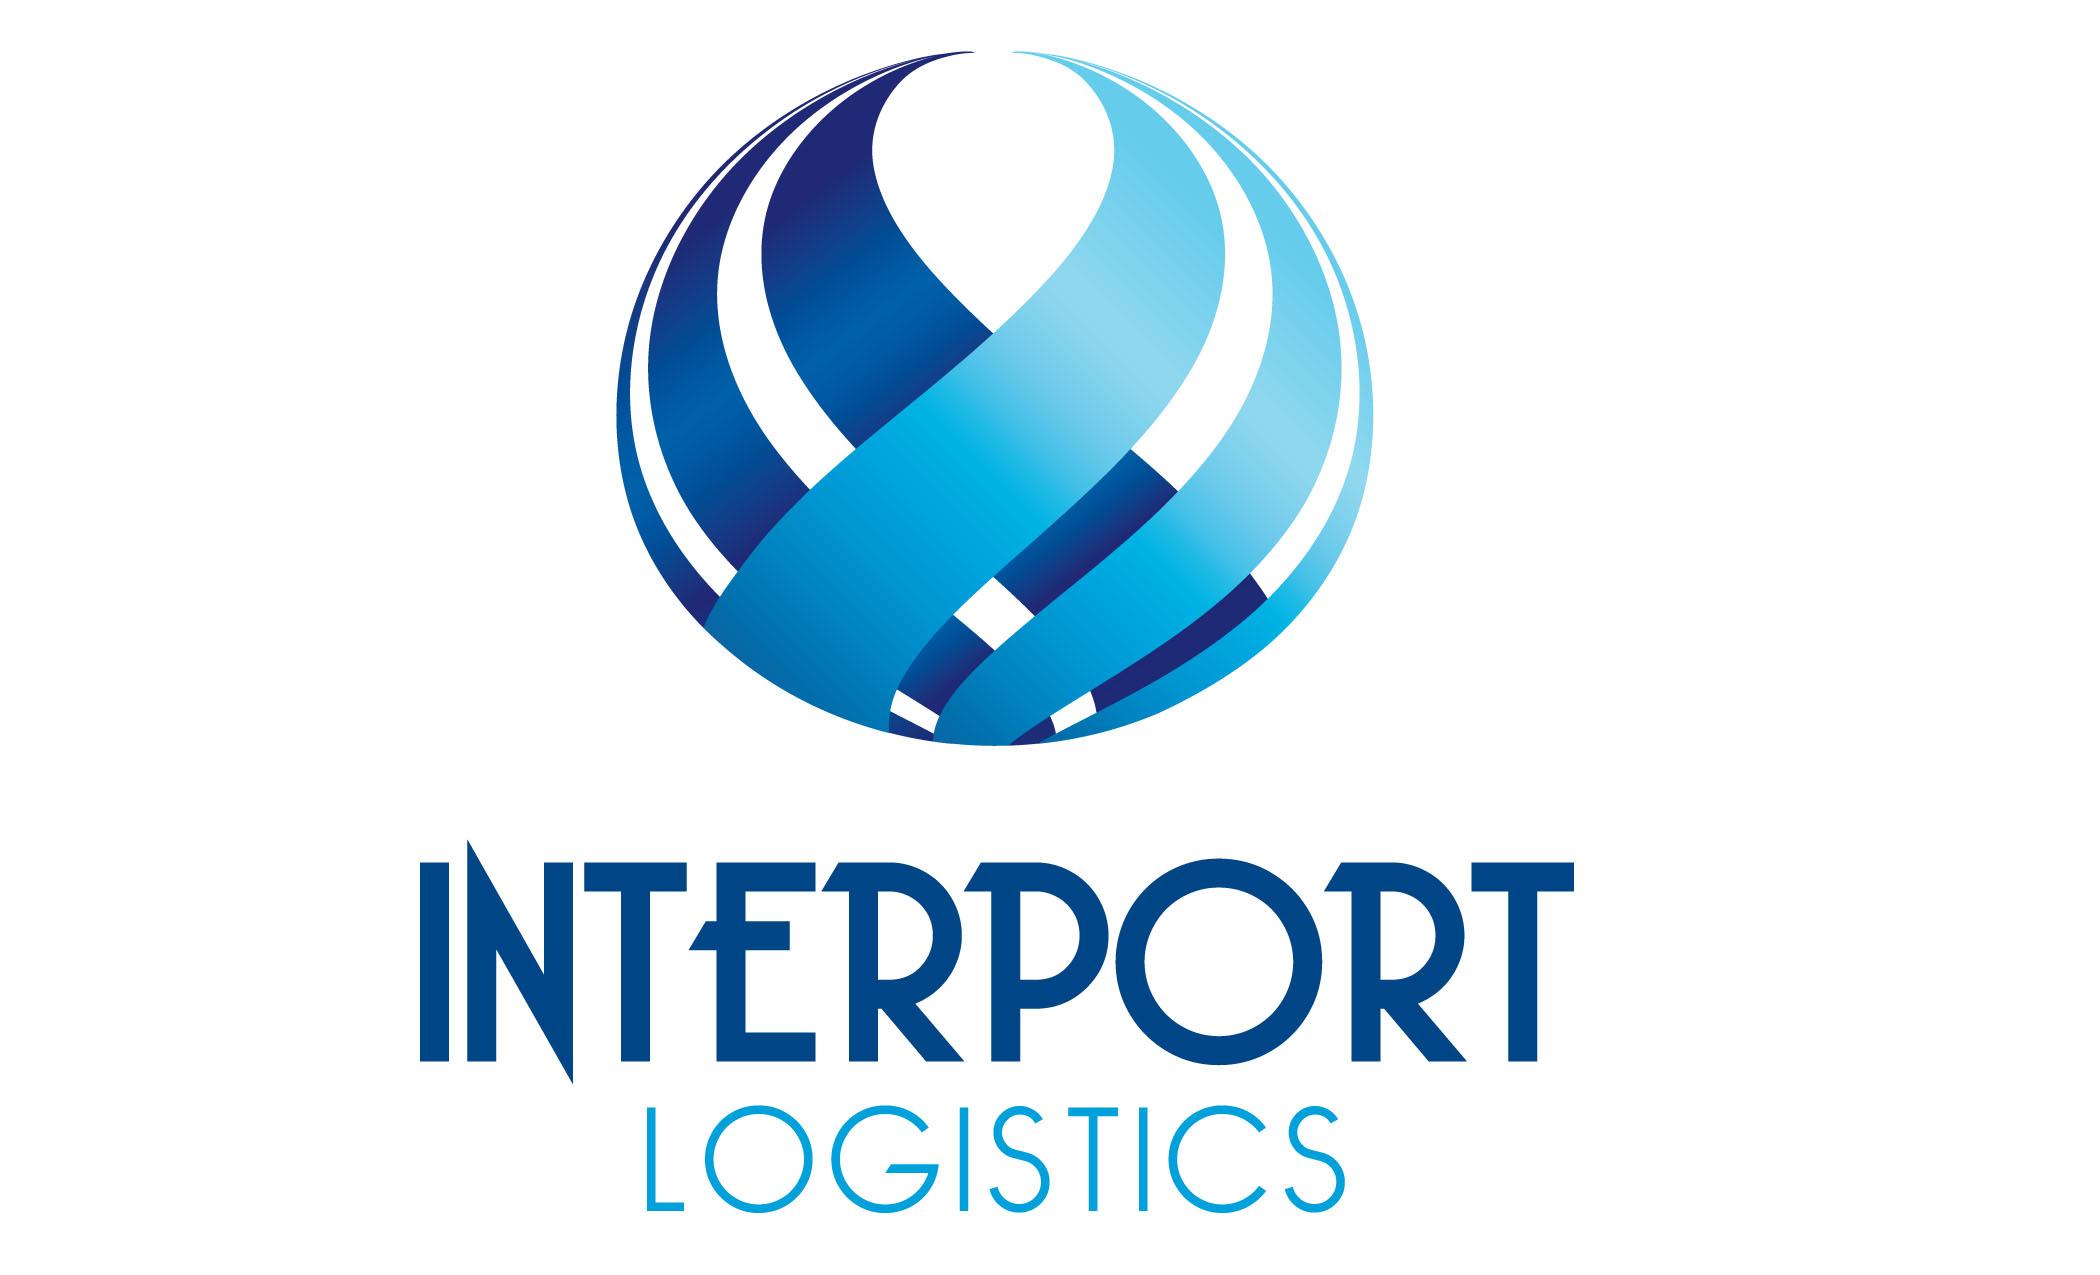 Interport